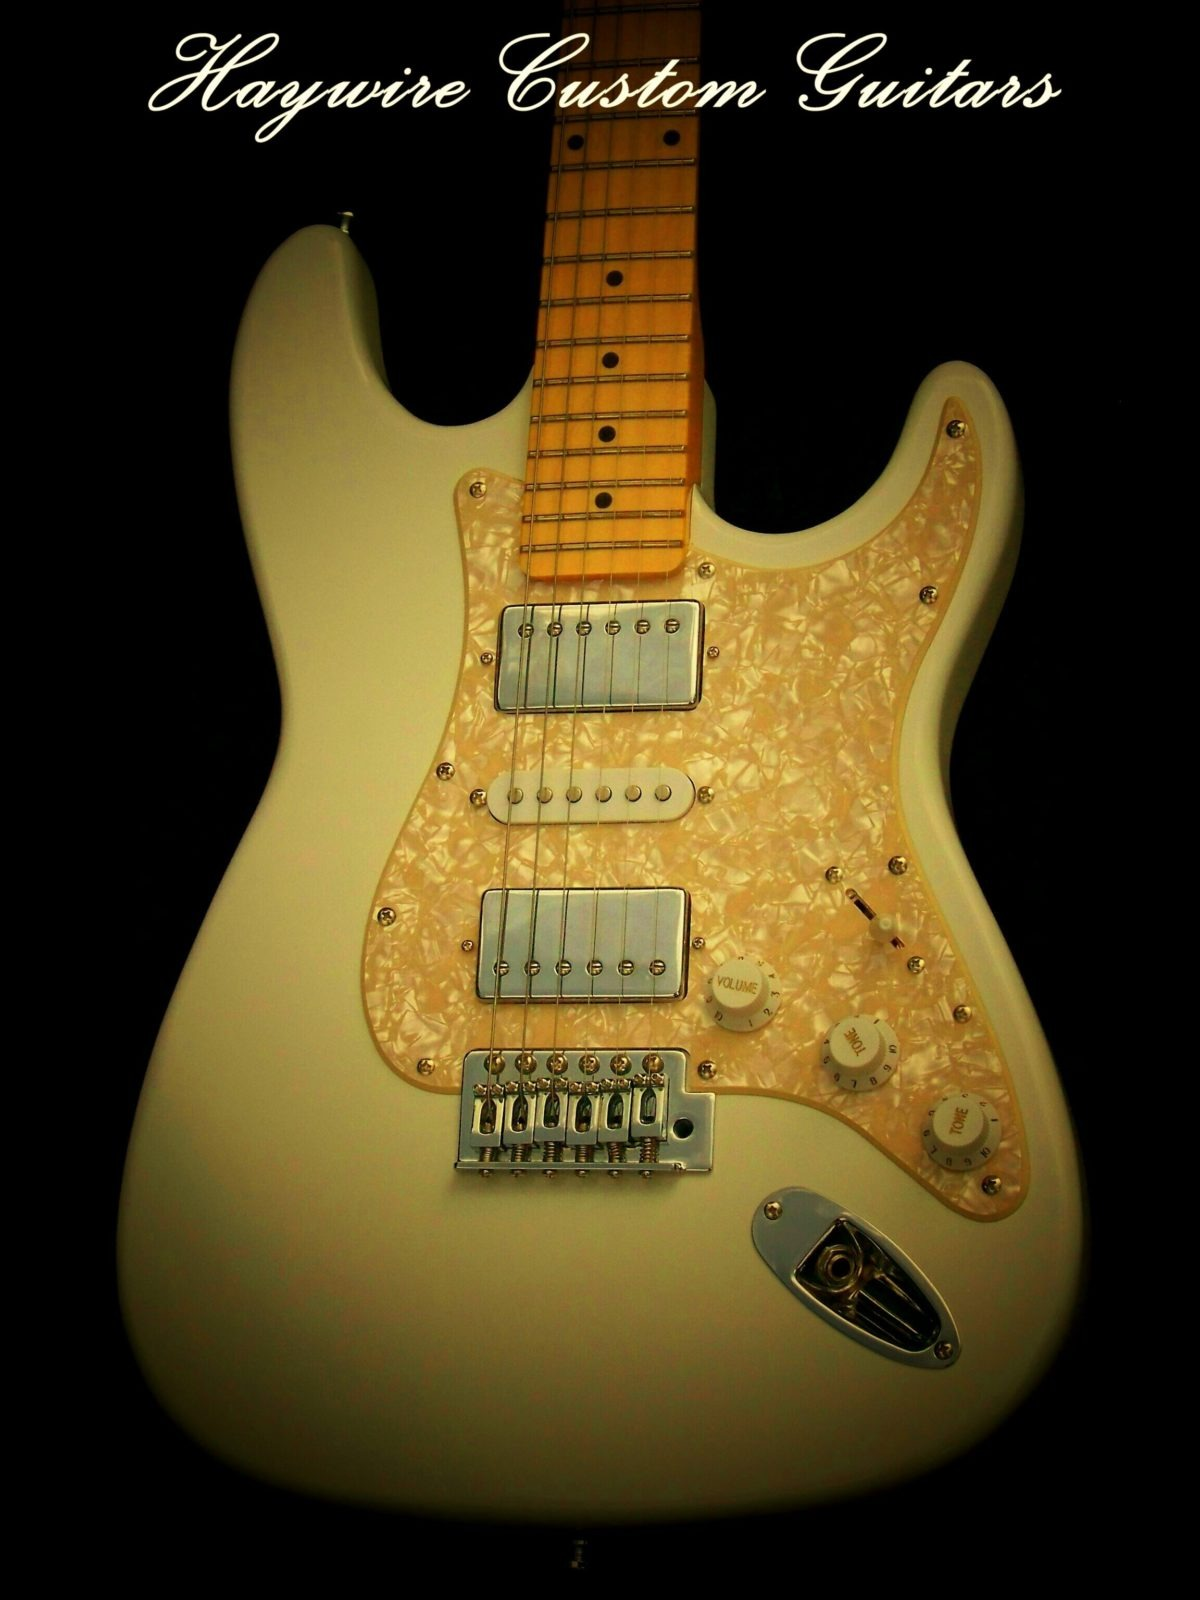 image Adjustable Pole Piece On Humbucker Guitar Pickups